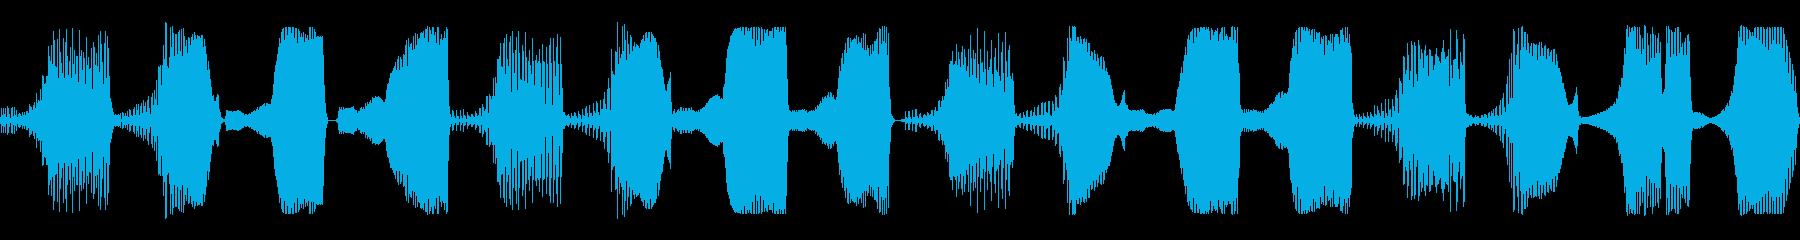 bassの再生済みの波形